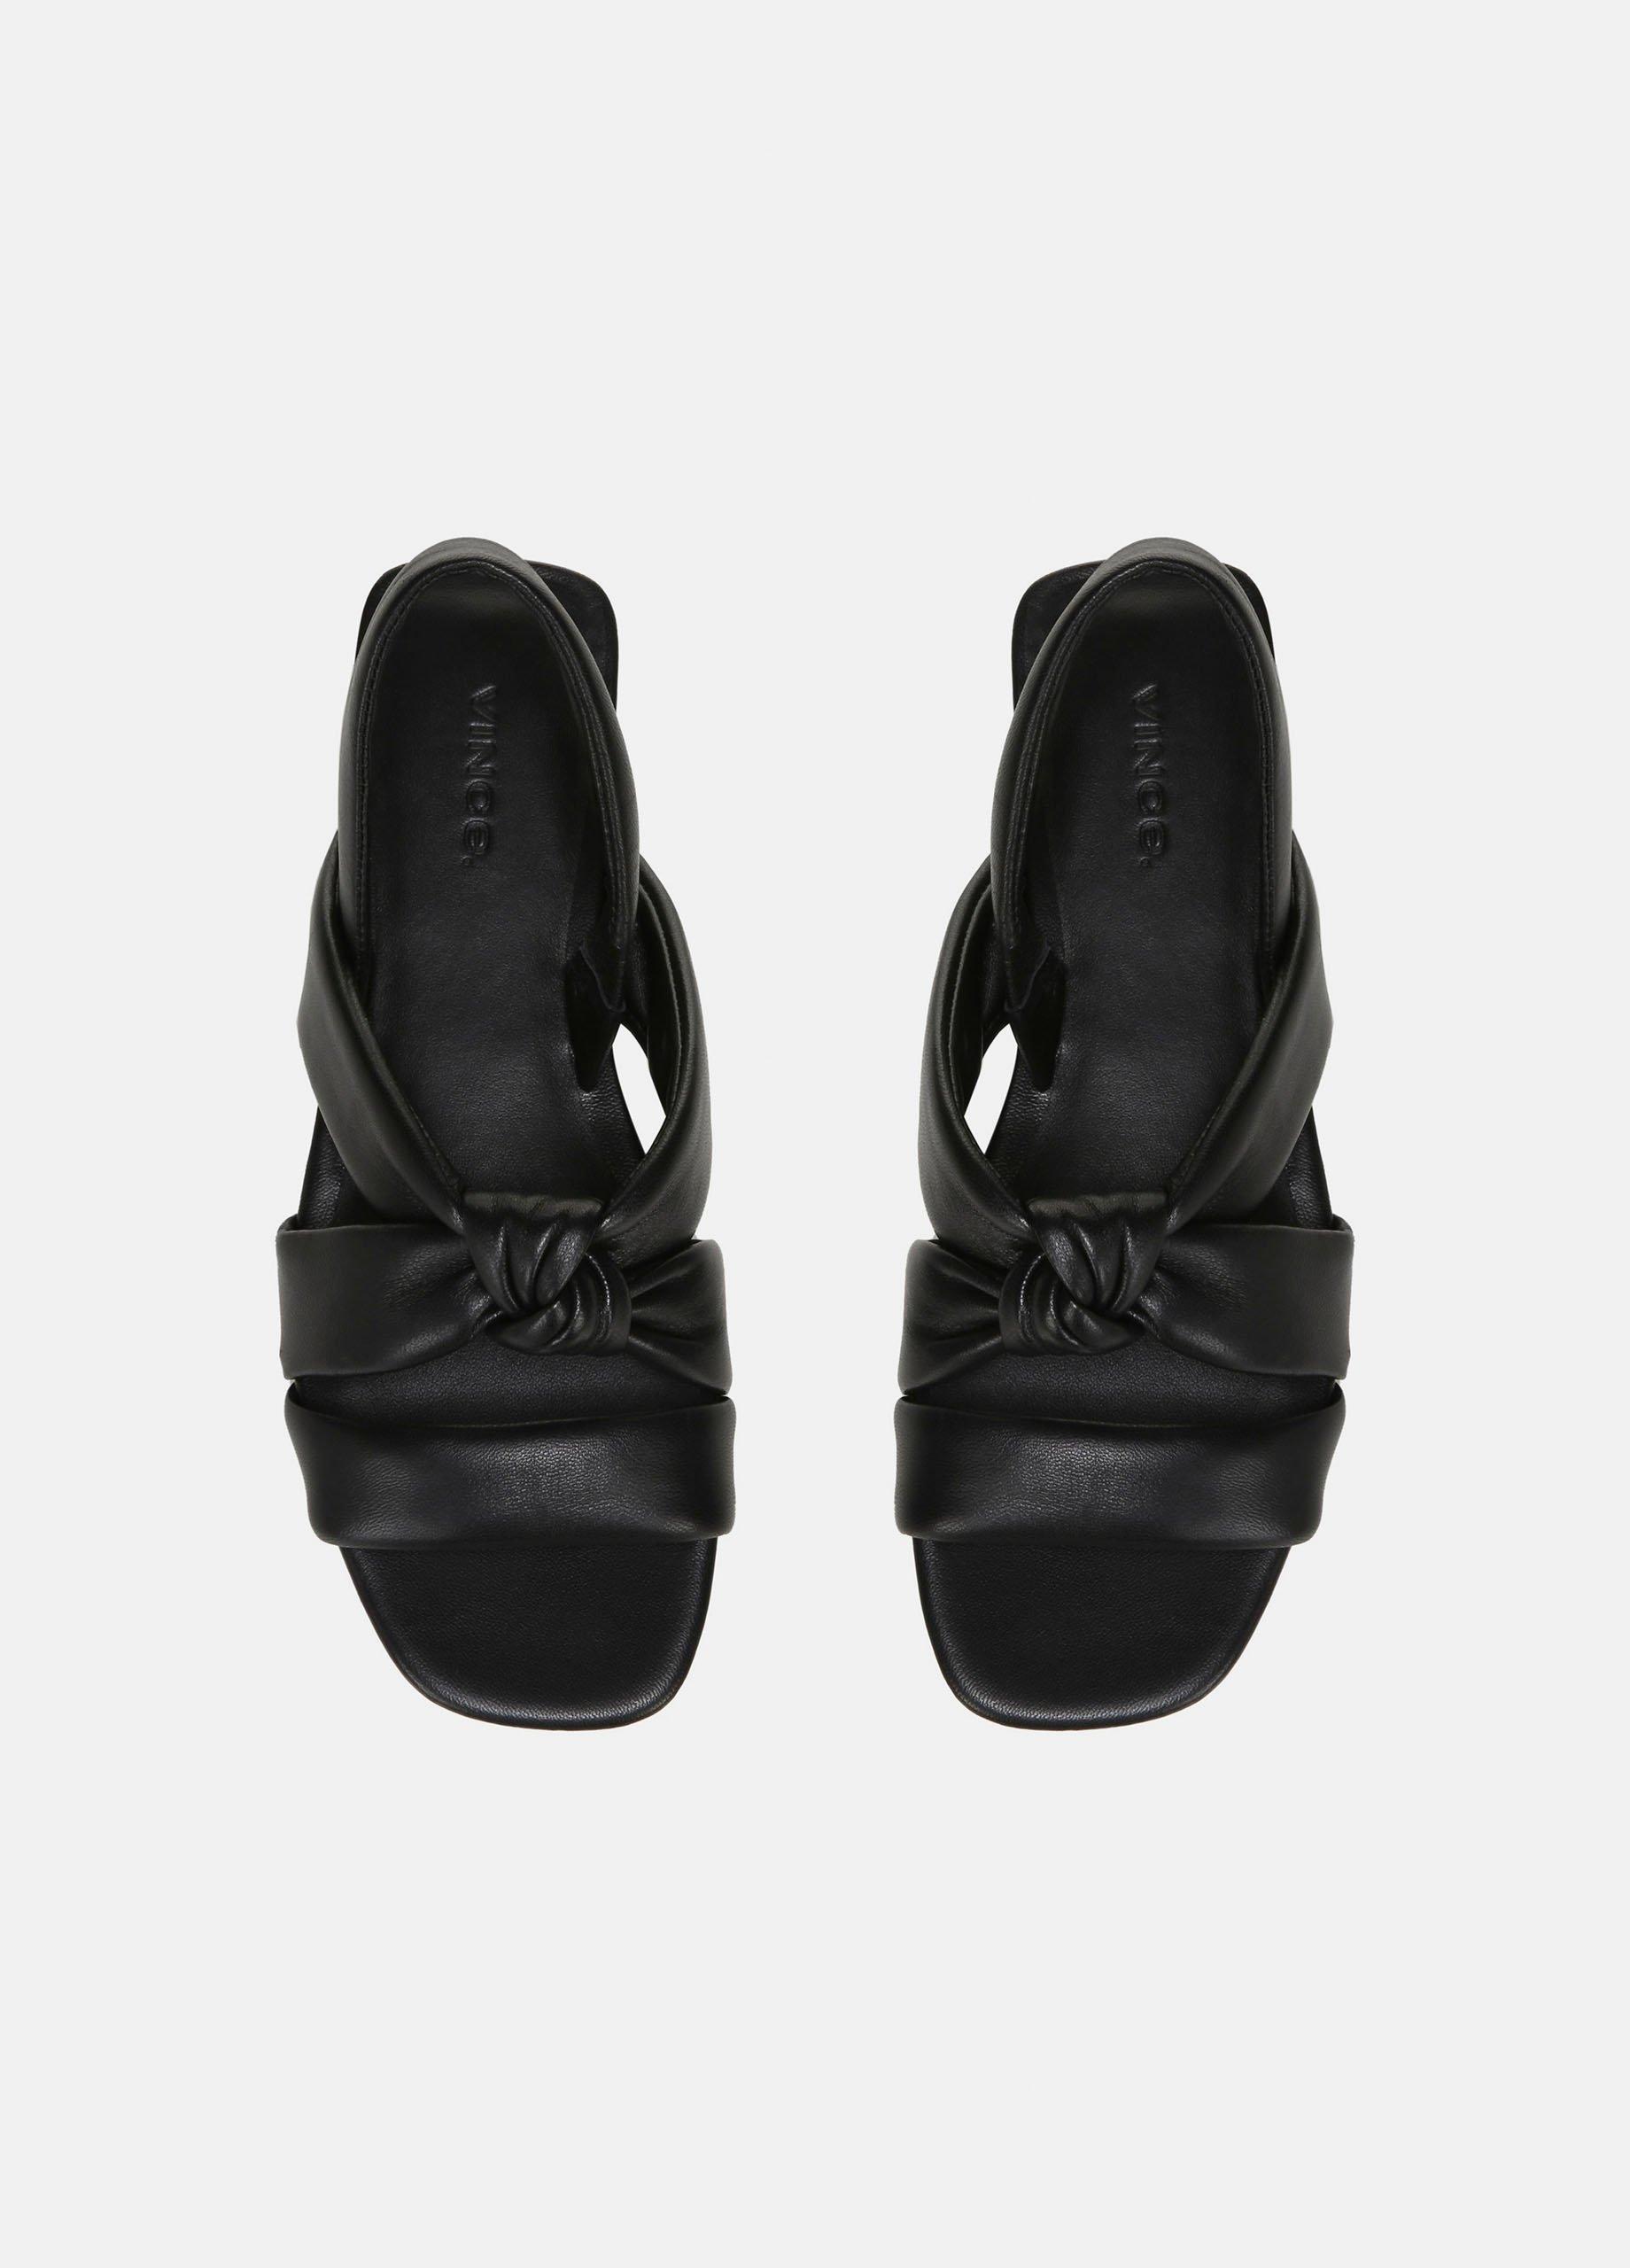 Elm Leather Sandal